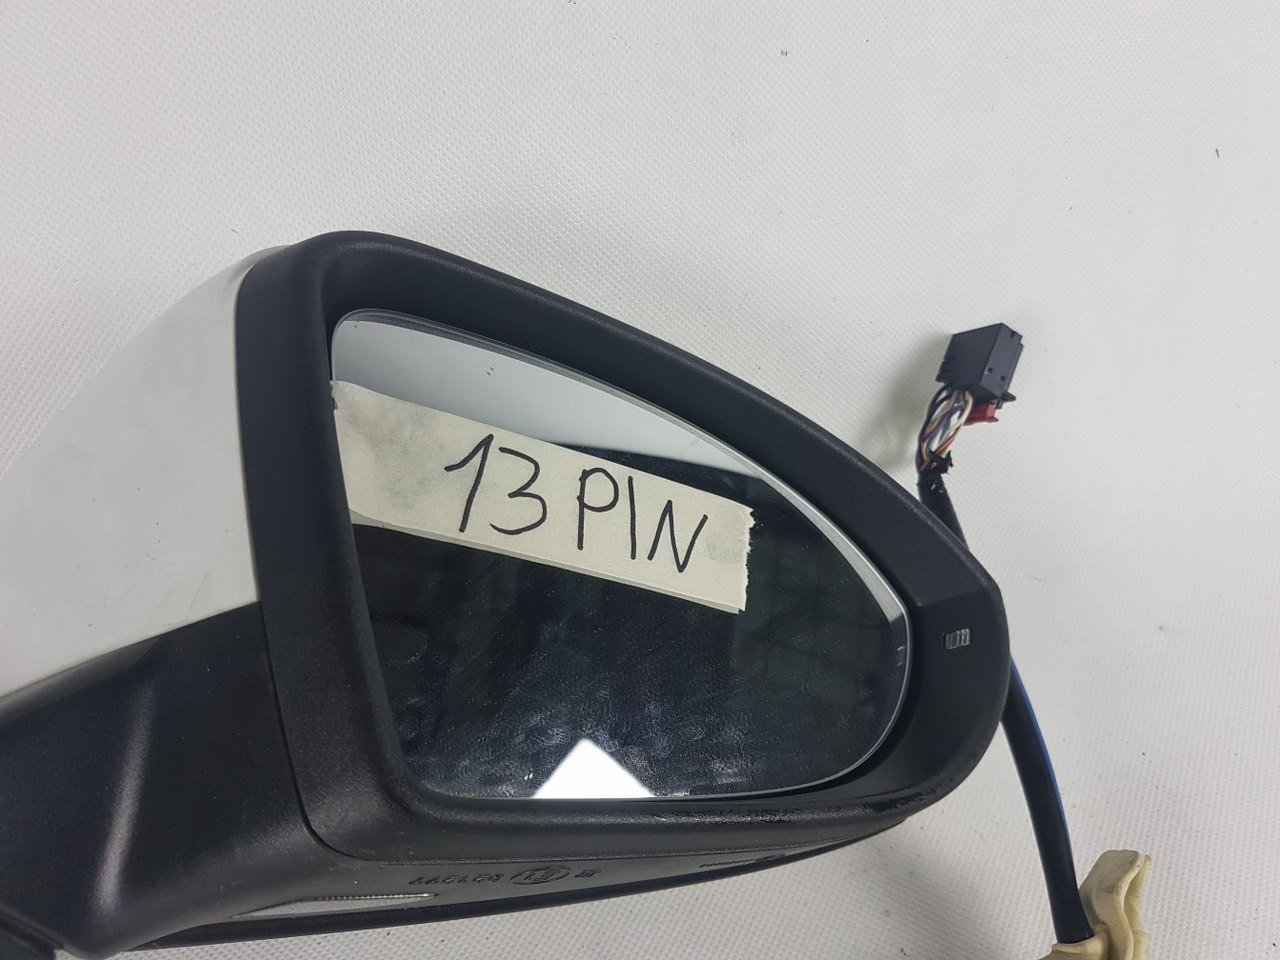 Spiegel Golf 7 : Rechts außenspiegel aussensspiegel vw golf vii pin lc a